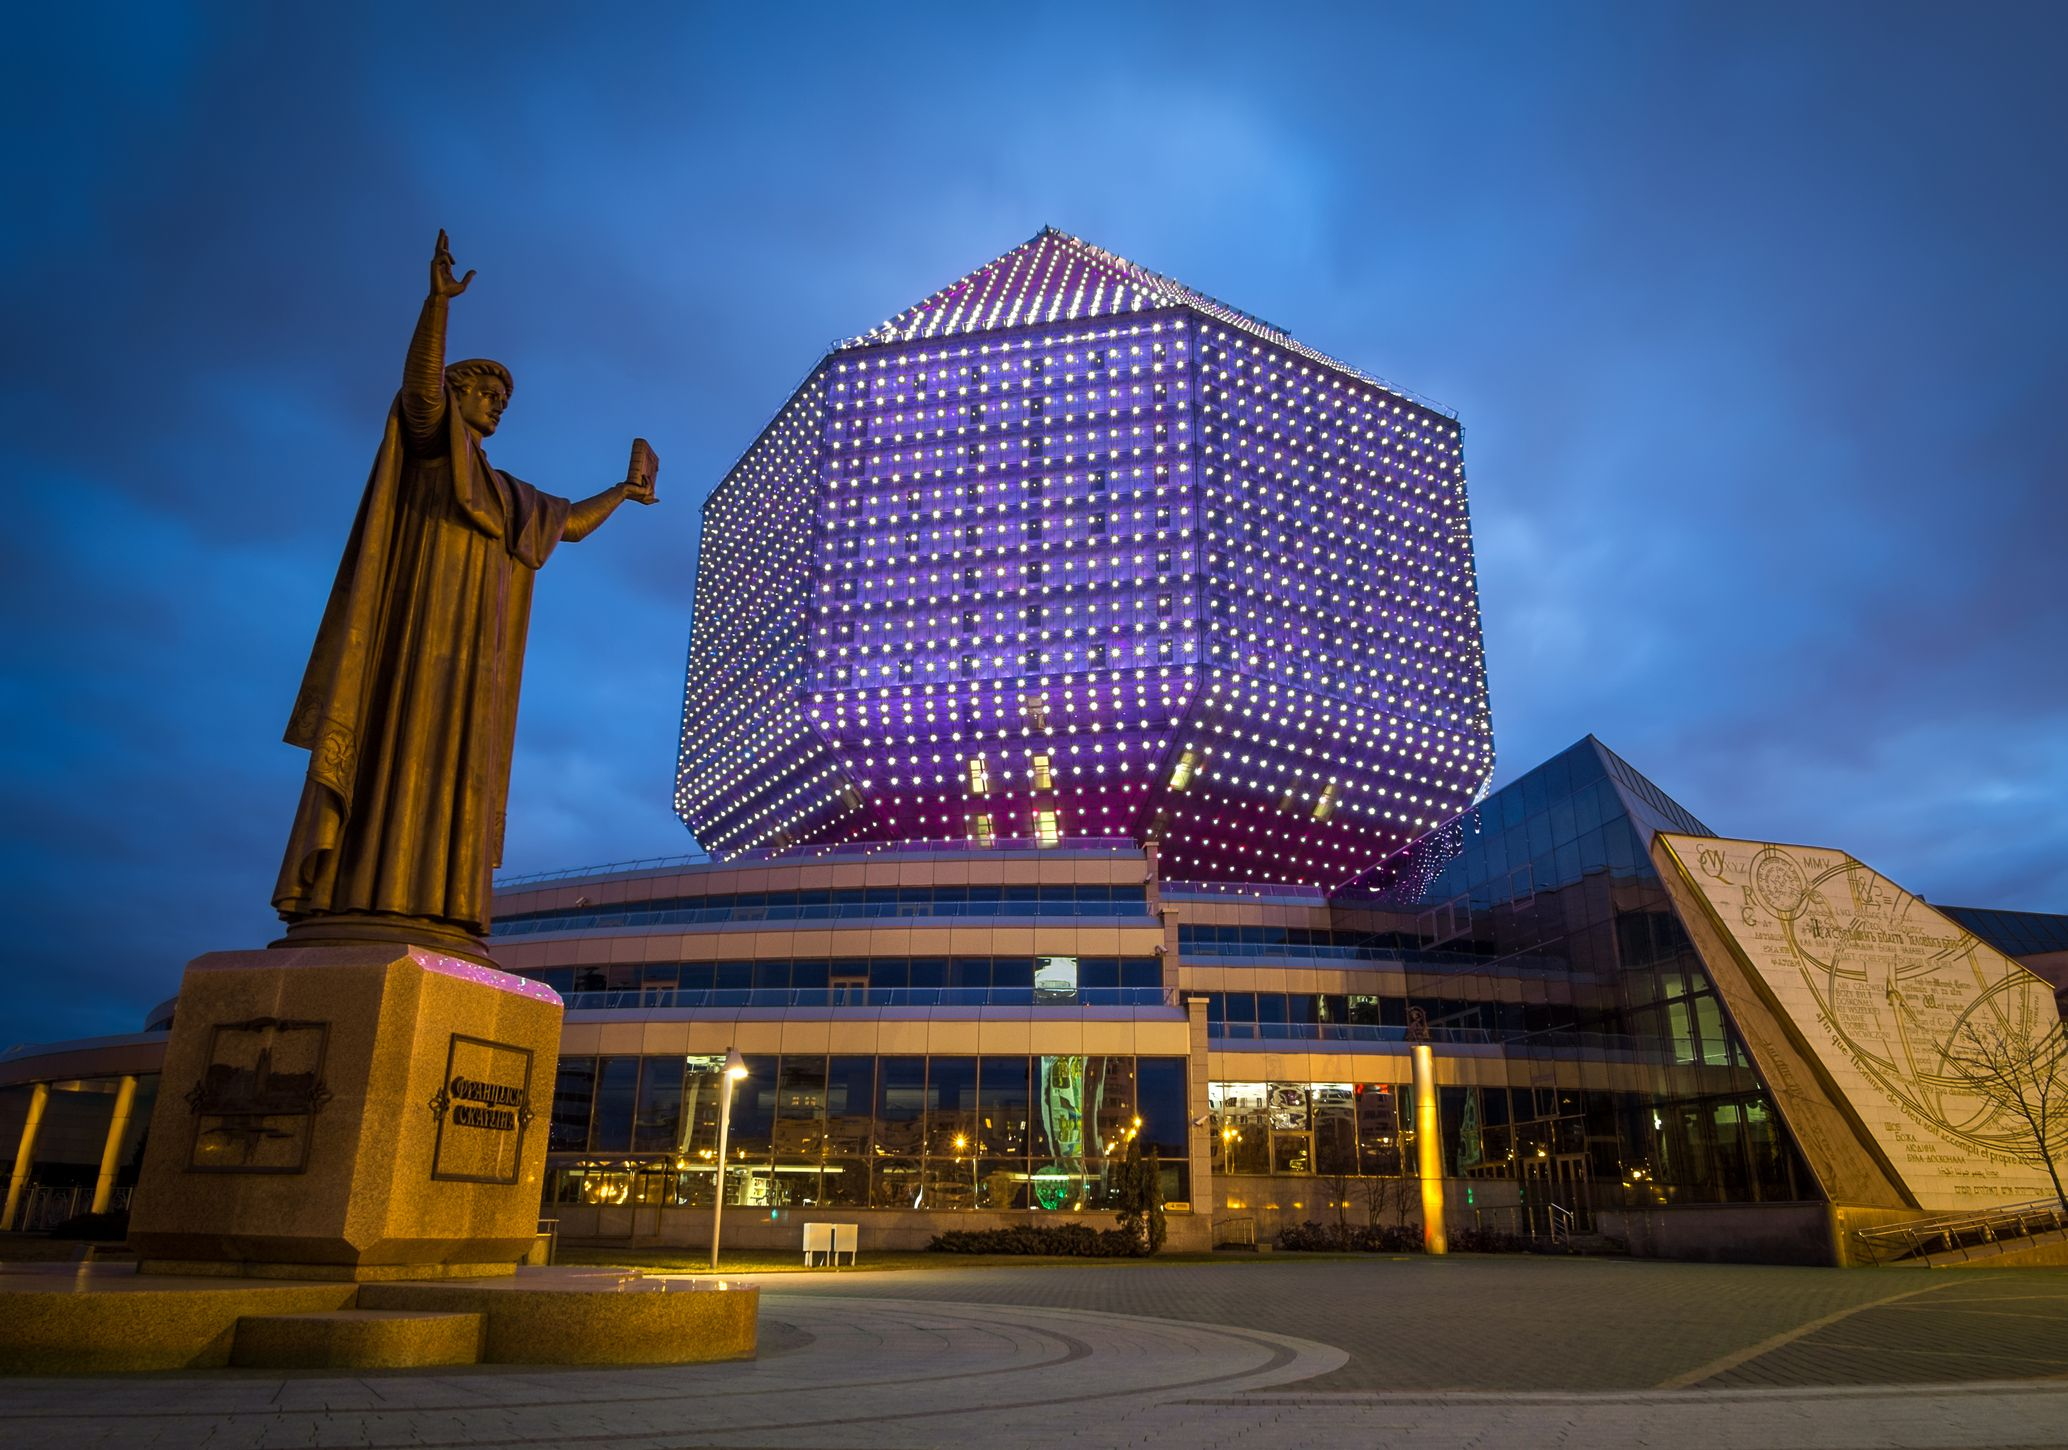 minsk-biblioteca-nacional-de-bielorrusia-secret-world